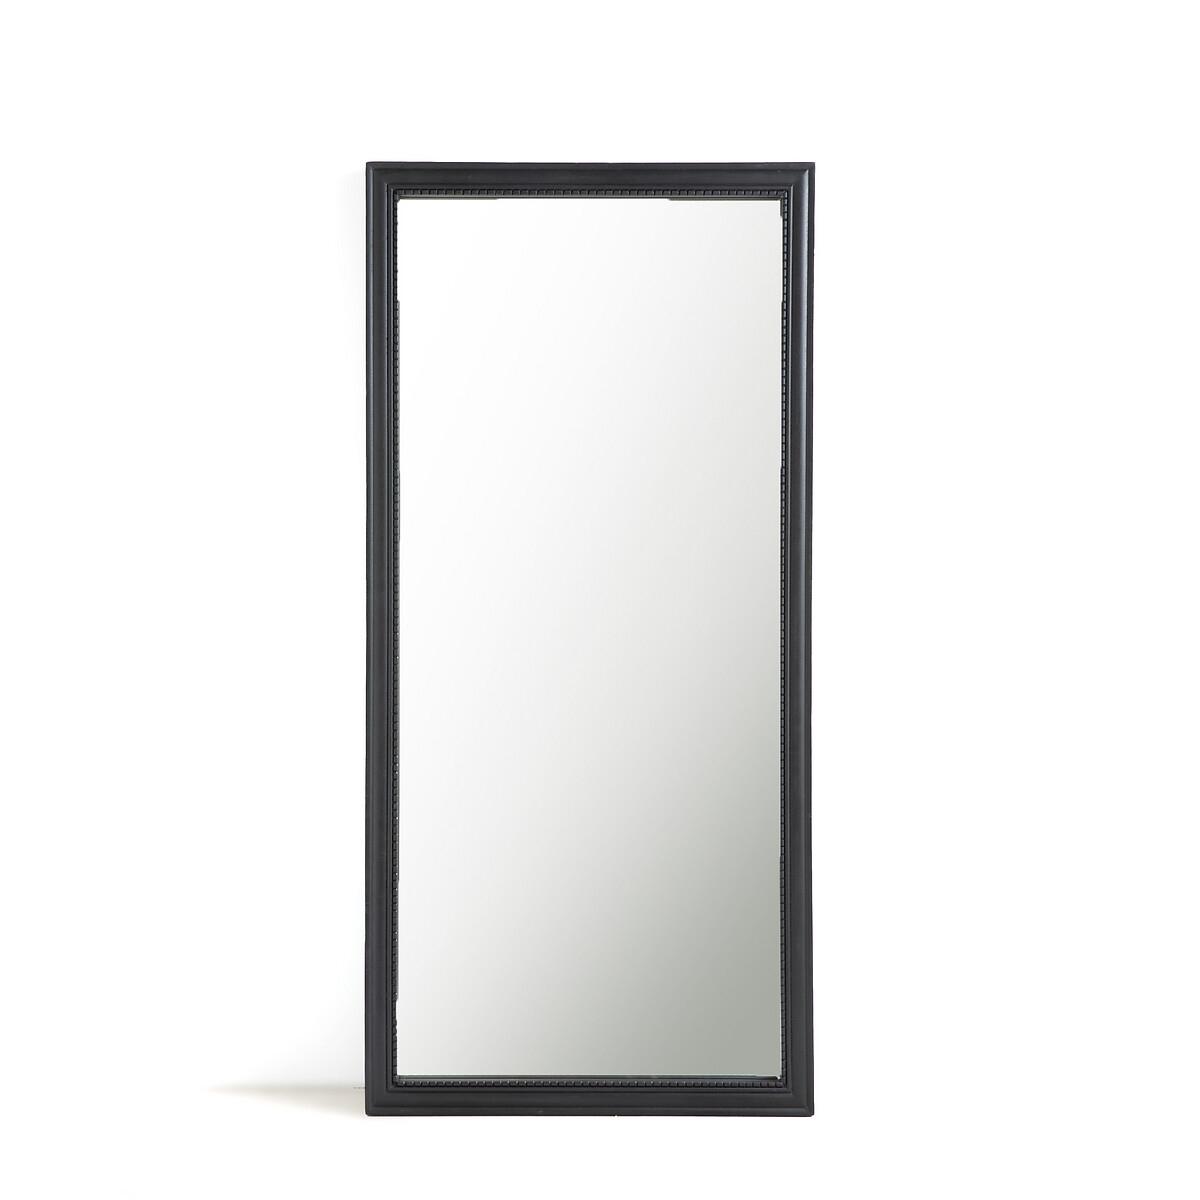 Miroir manguier massif rectangulaire H170 cm Afsan